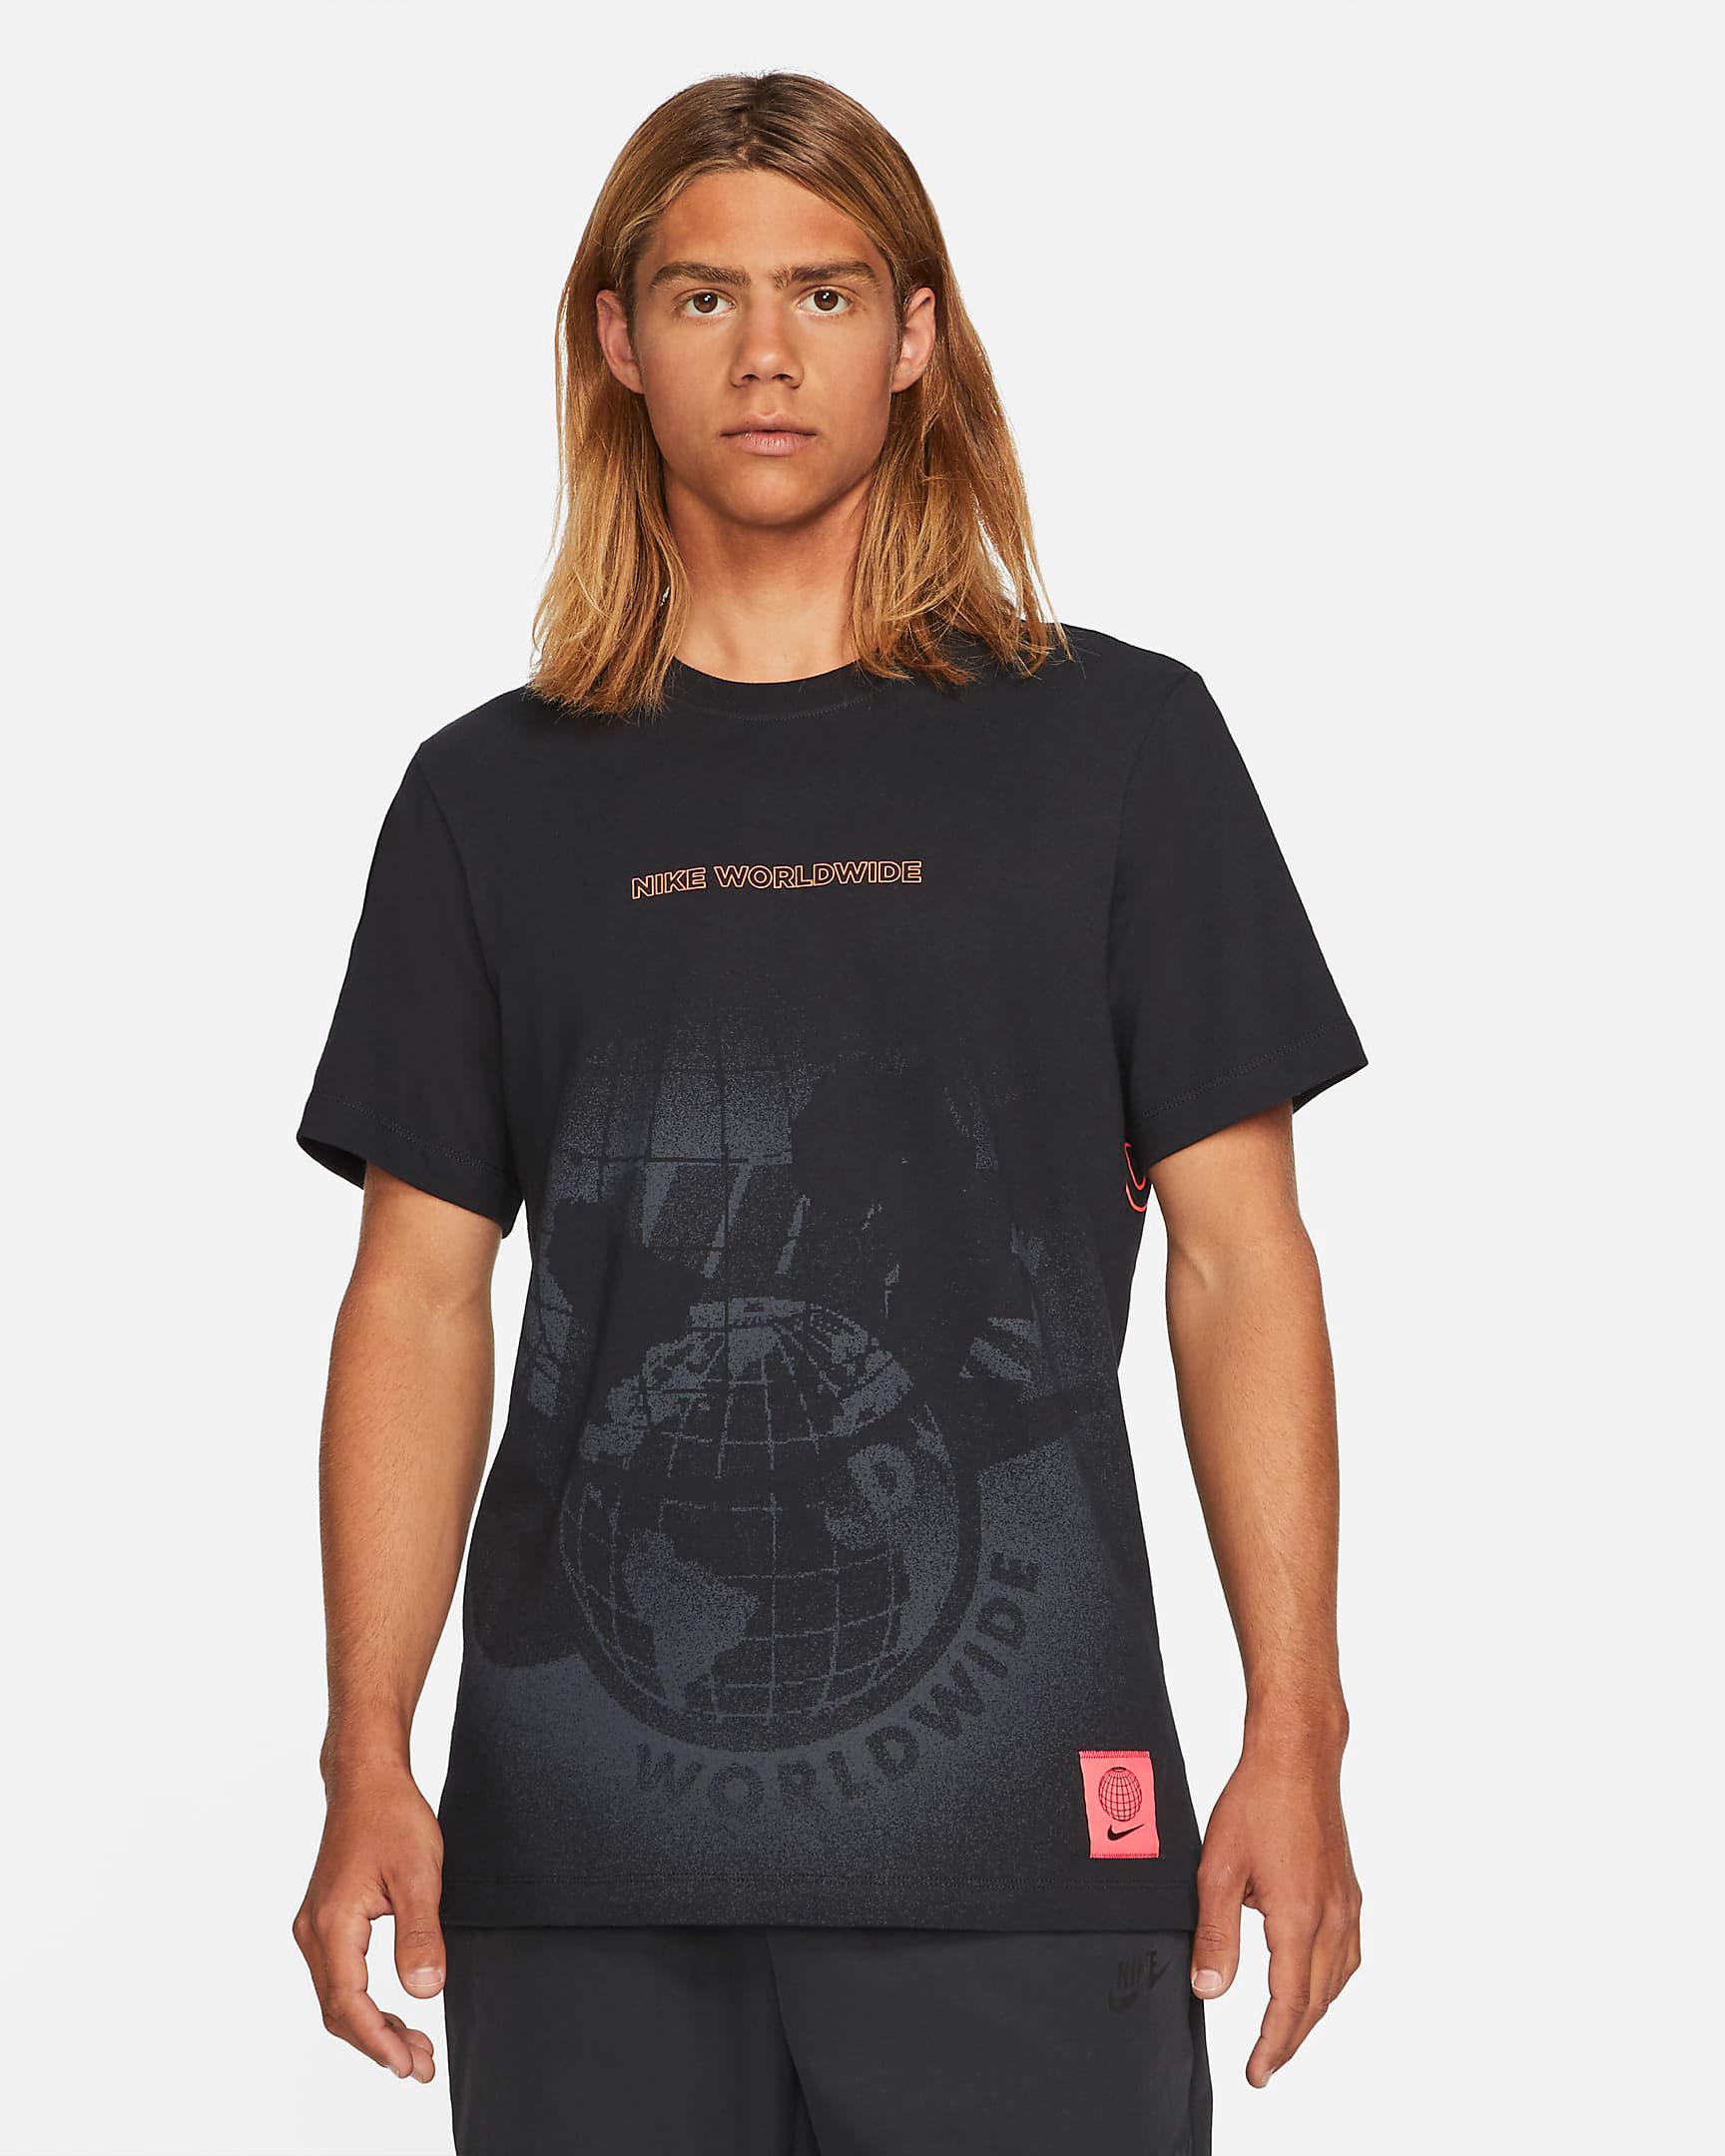 nike-worldwide-shirt-1